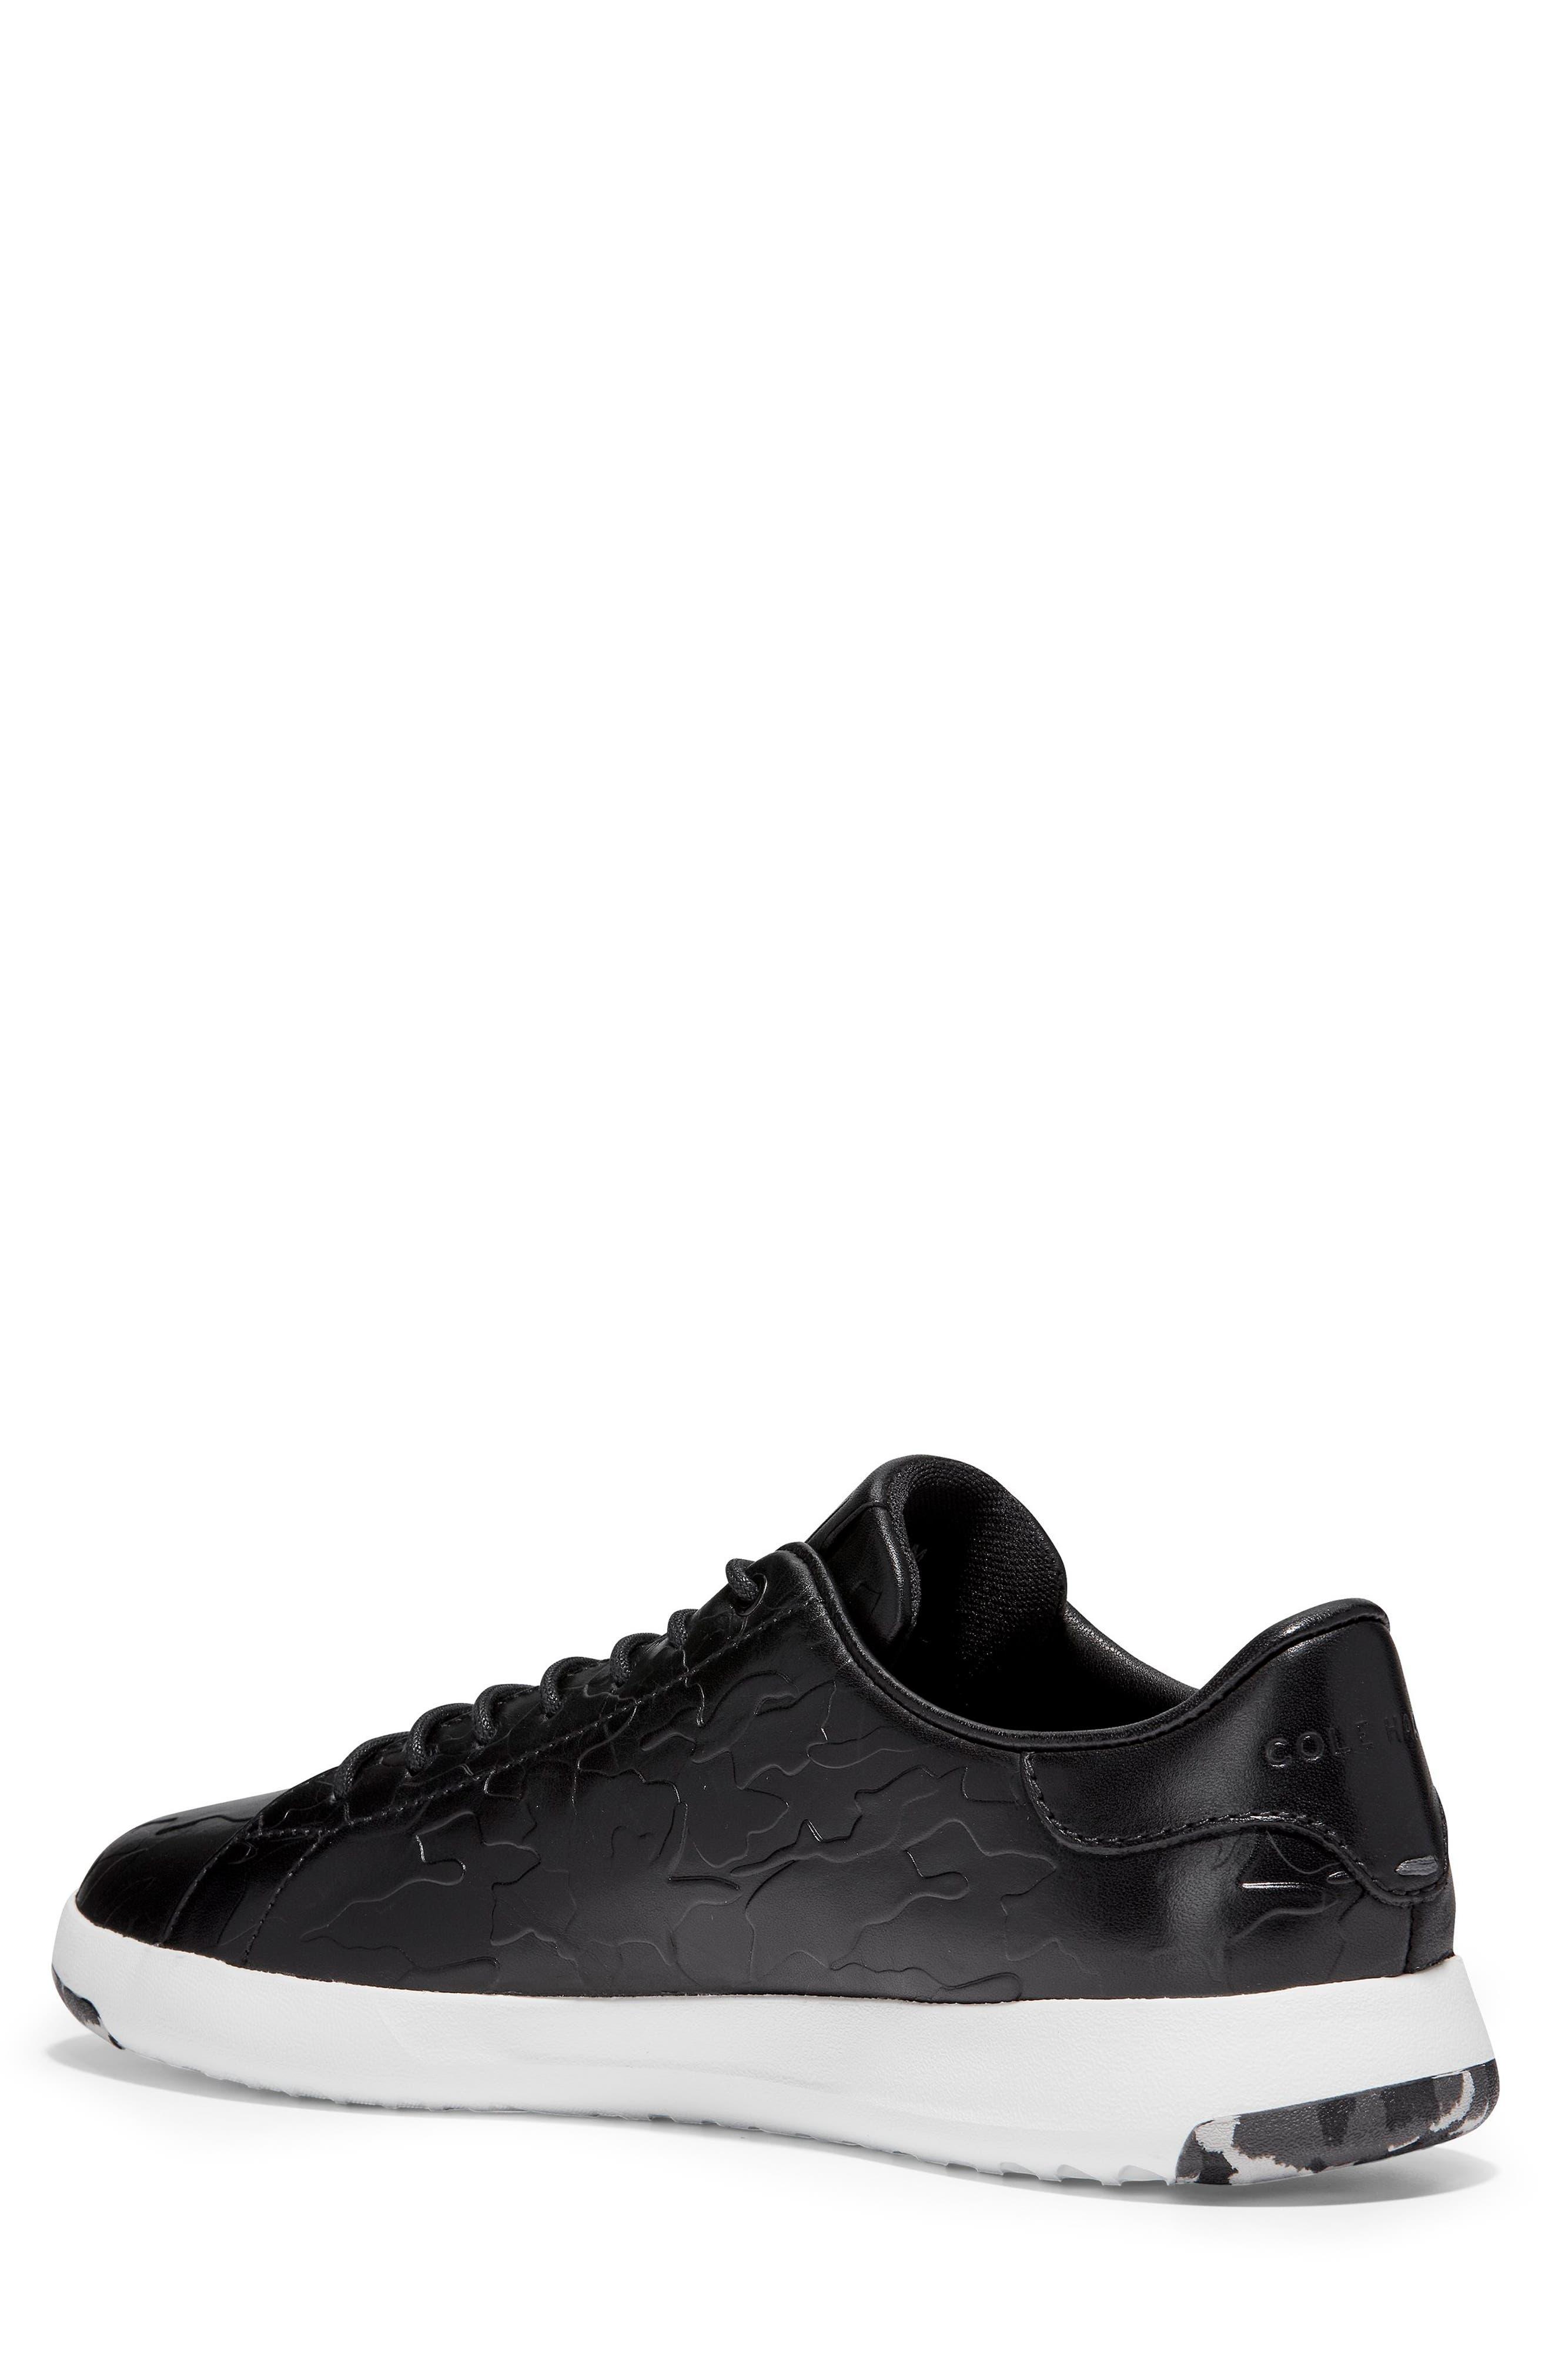 GrandPro Tennis Sneaker,                             Alternate thumbnail 2, color,                             BLACK/ CAMO LEATHER